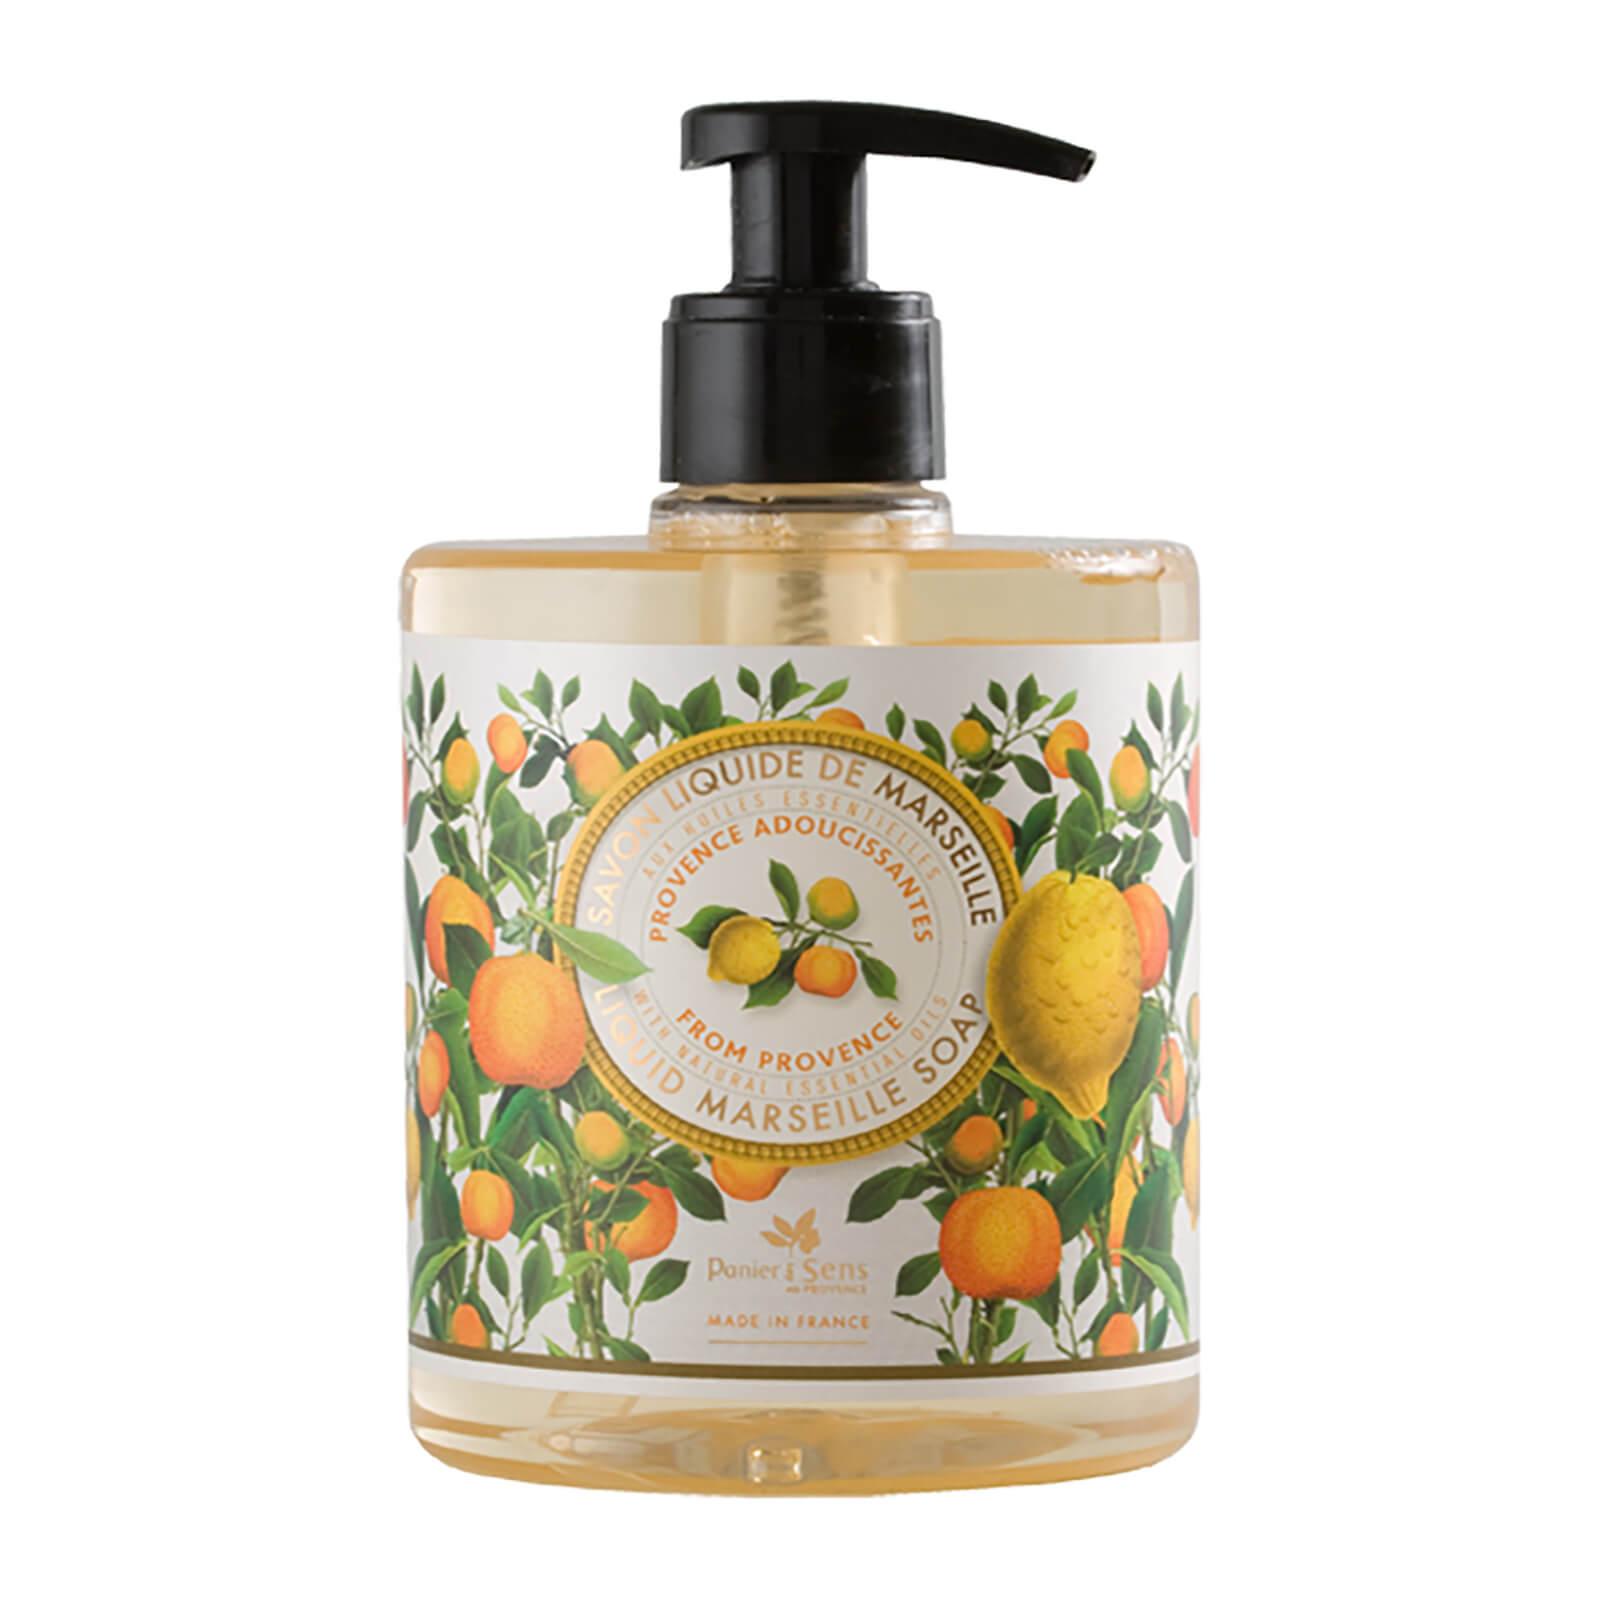 Купить Panier des Sens The Essentials Provence Essential Oils Liquid Marseille Soap